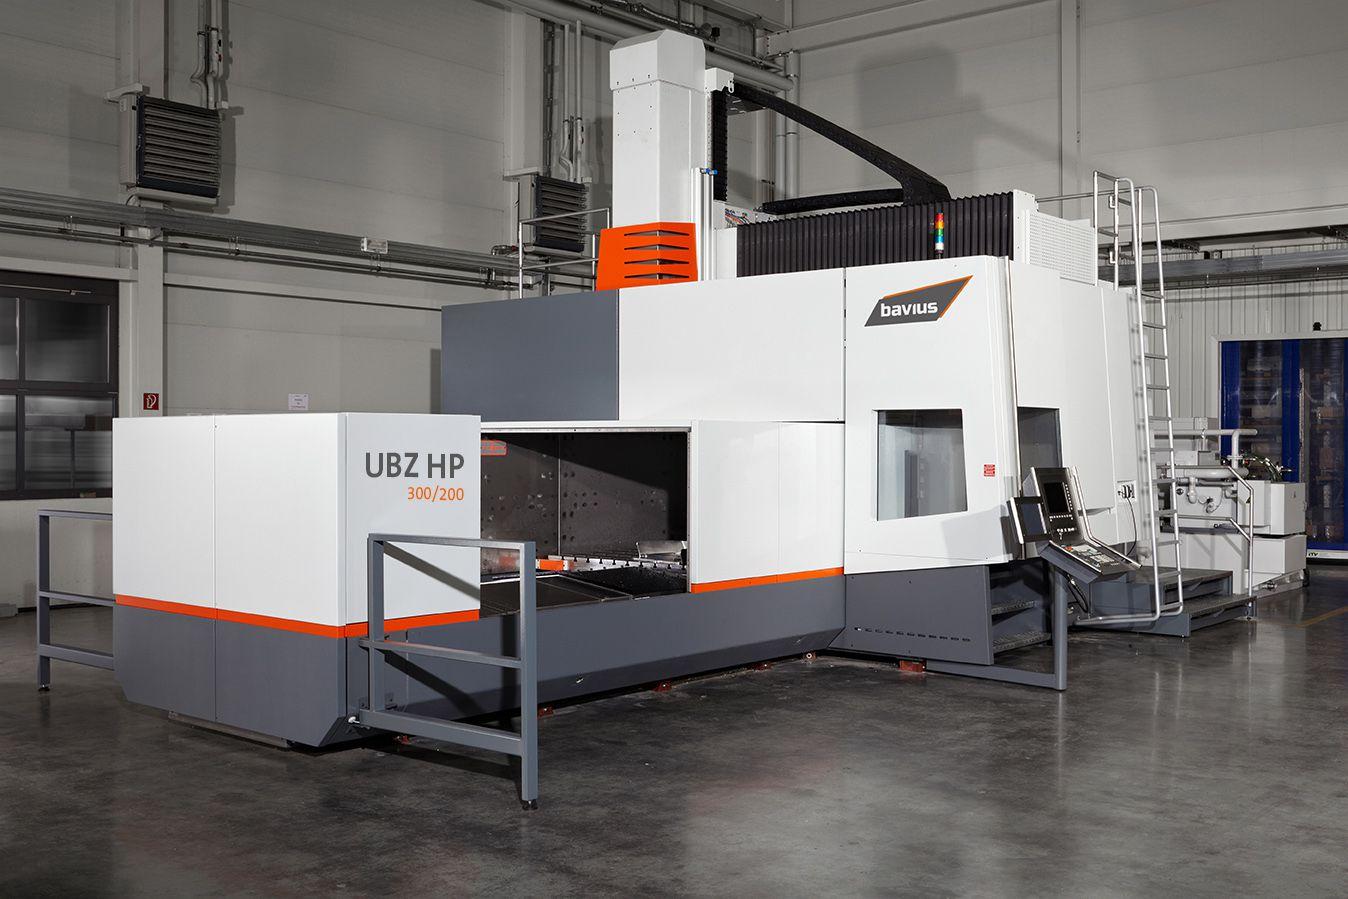 bavius-universal-machining-centres-ubz-hd